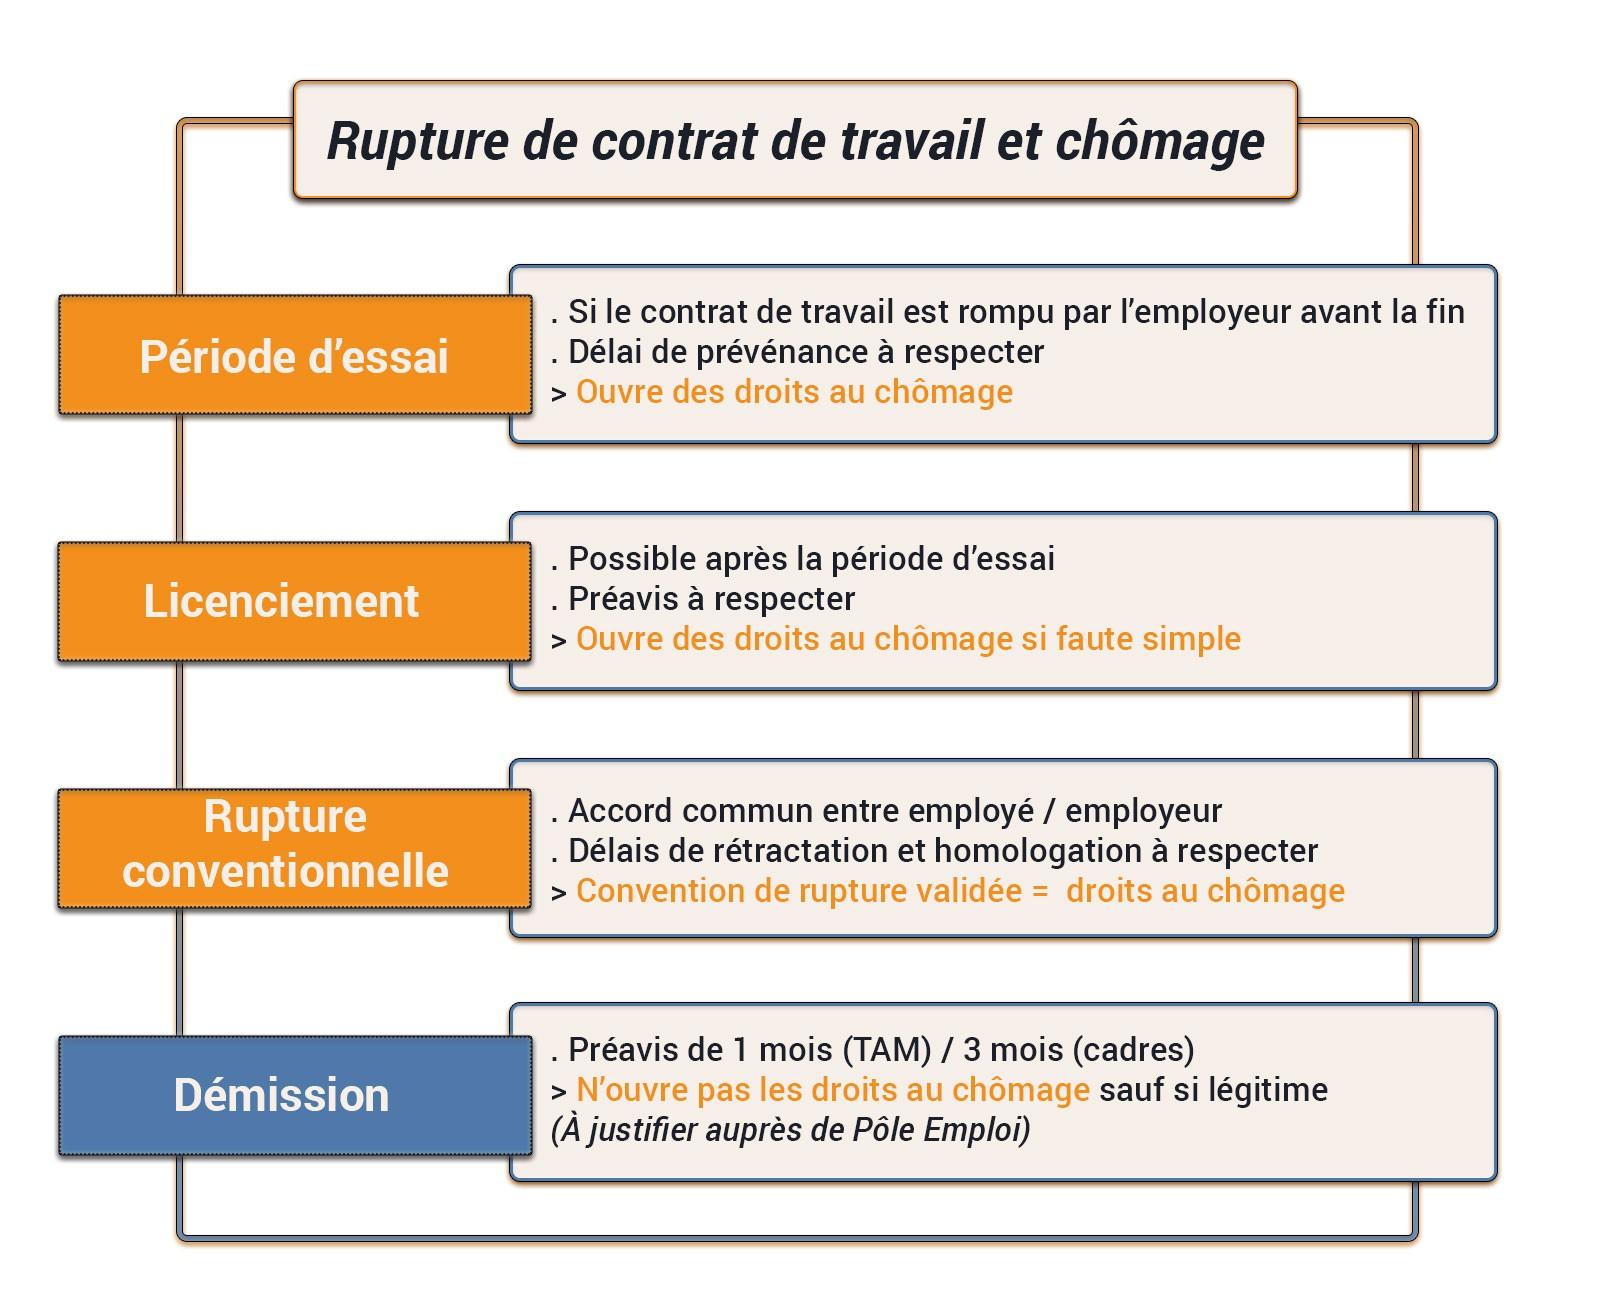 schema-rupture-contrat-ouverture-chômage-portage-salarial